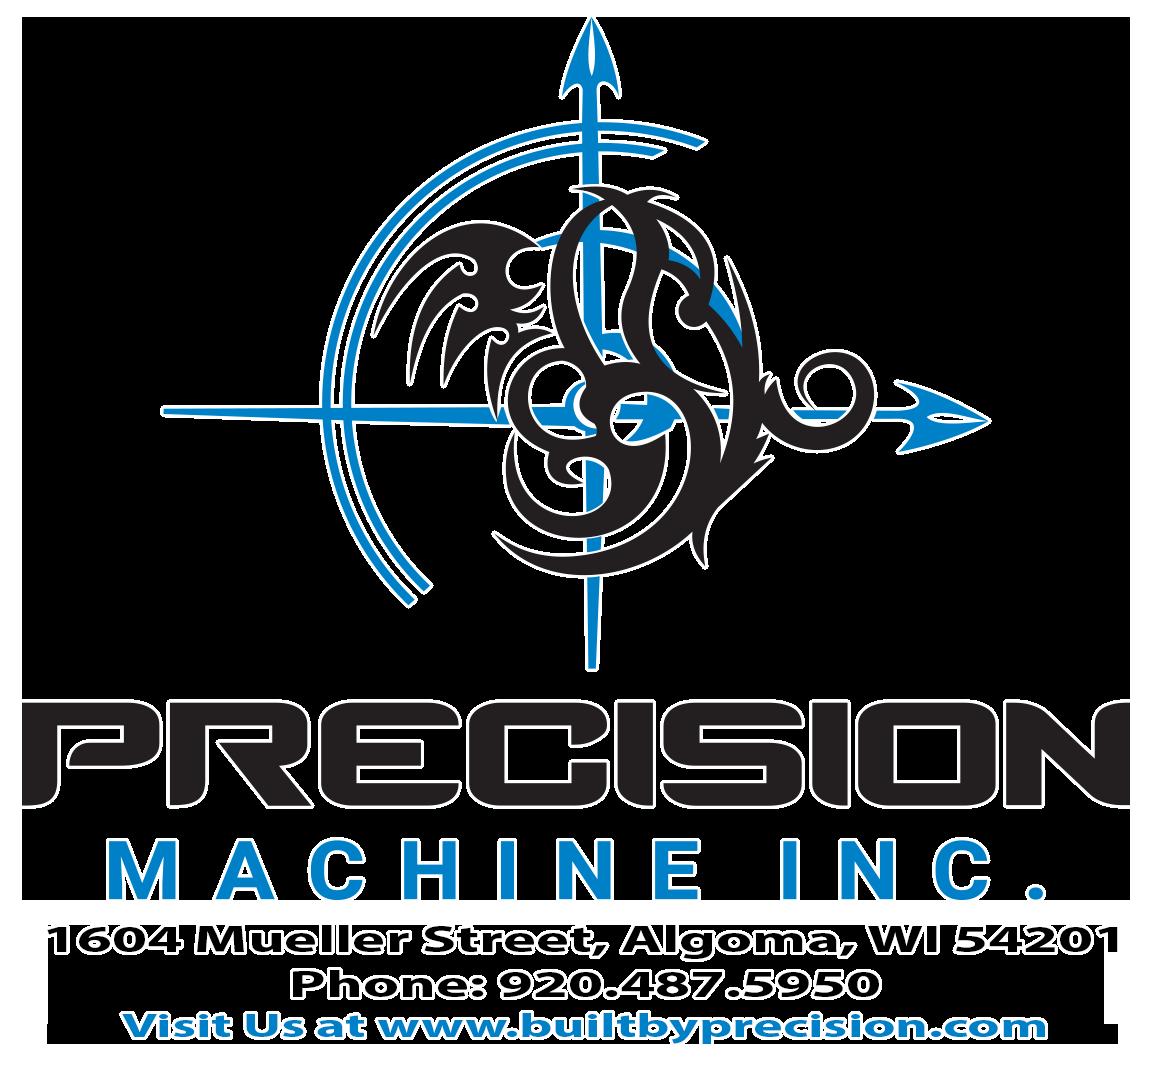 Precision Machine, Inc.